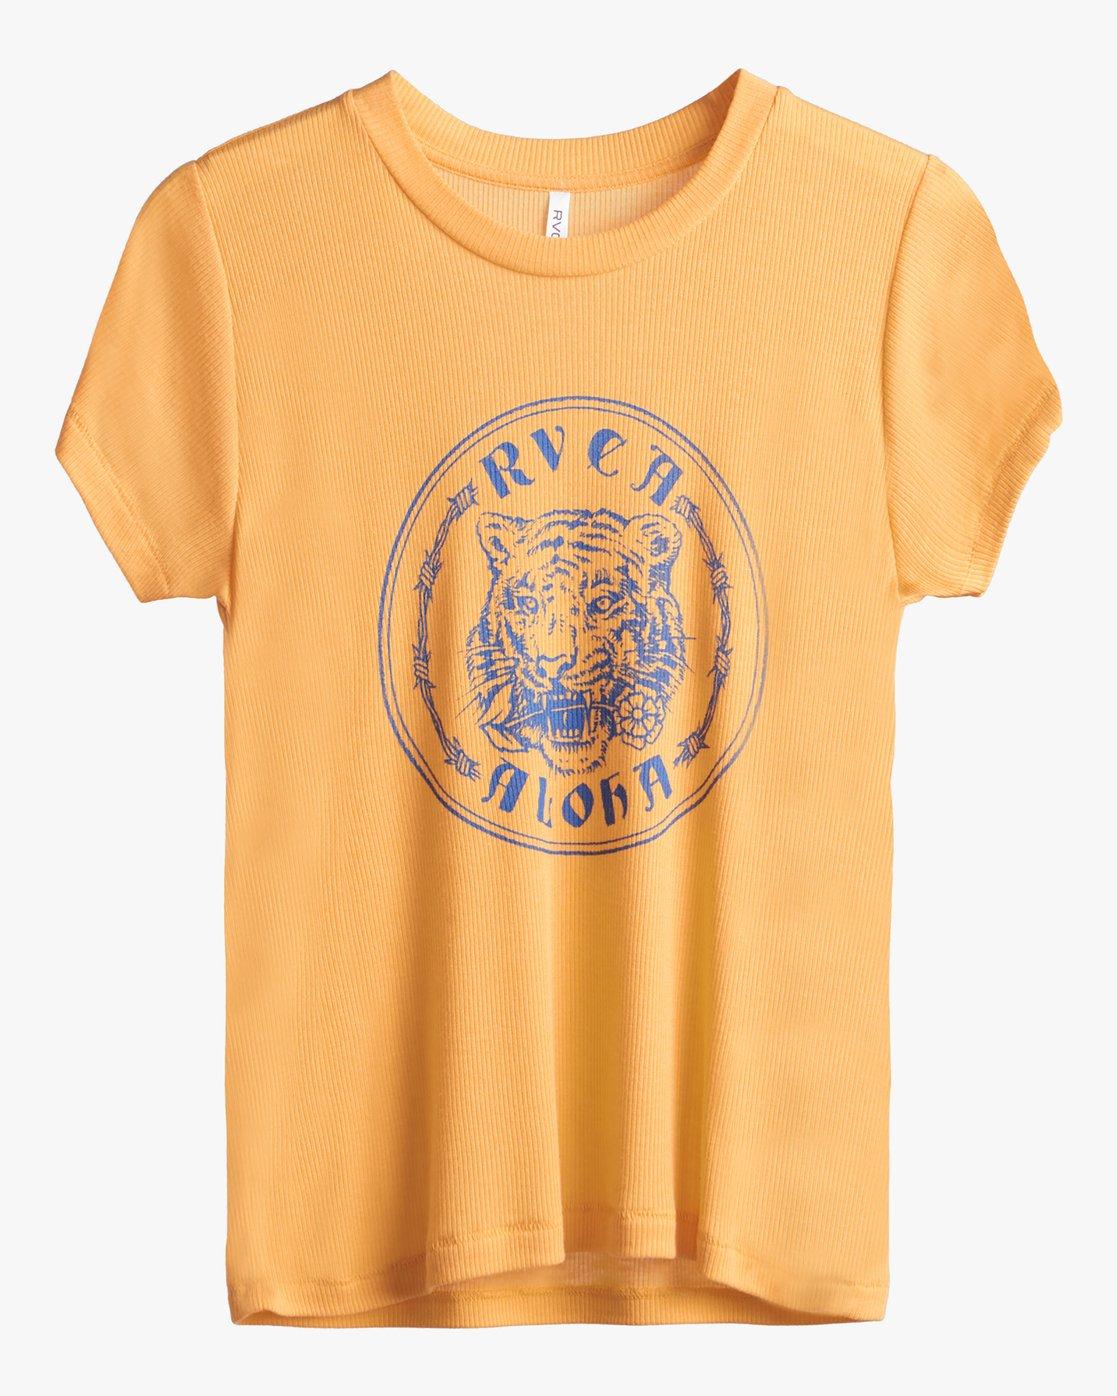 3 Benjamin Jeanjean Alohatiger - T-Shirt for T-Shirt Yellow S3SSRIRVP0 RVCA